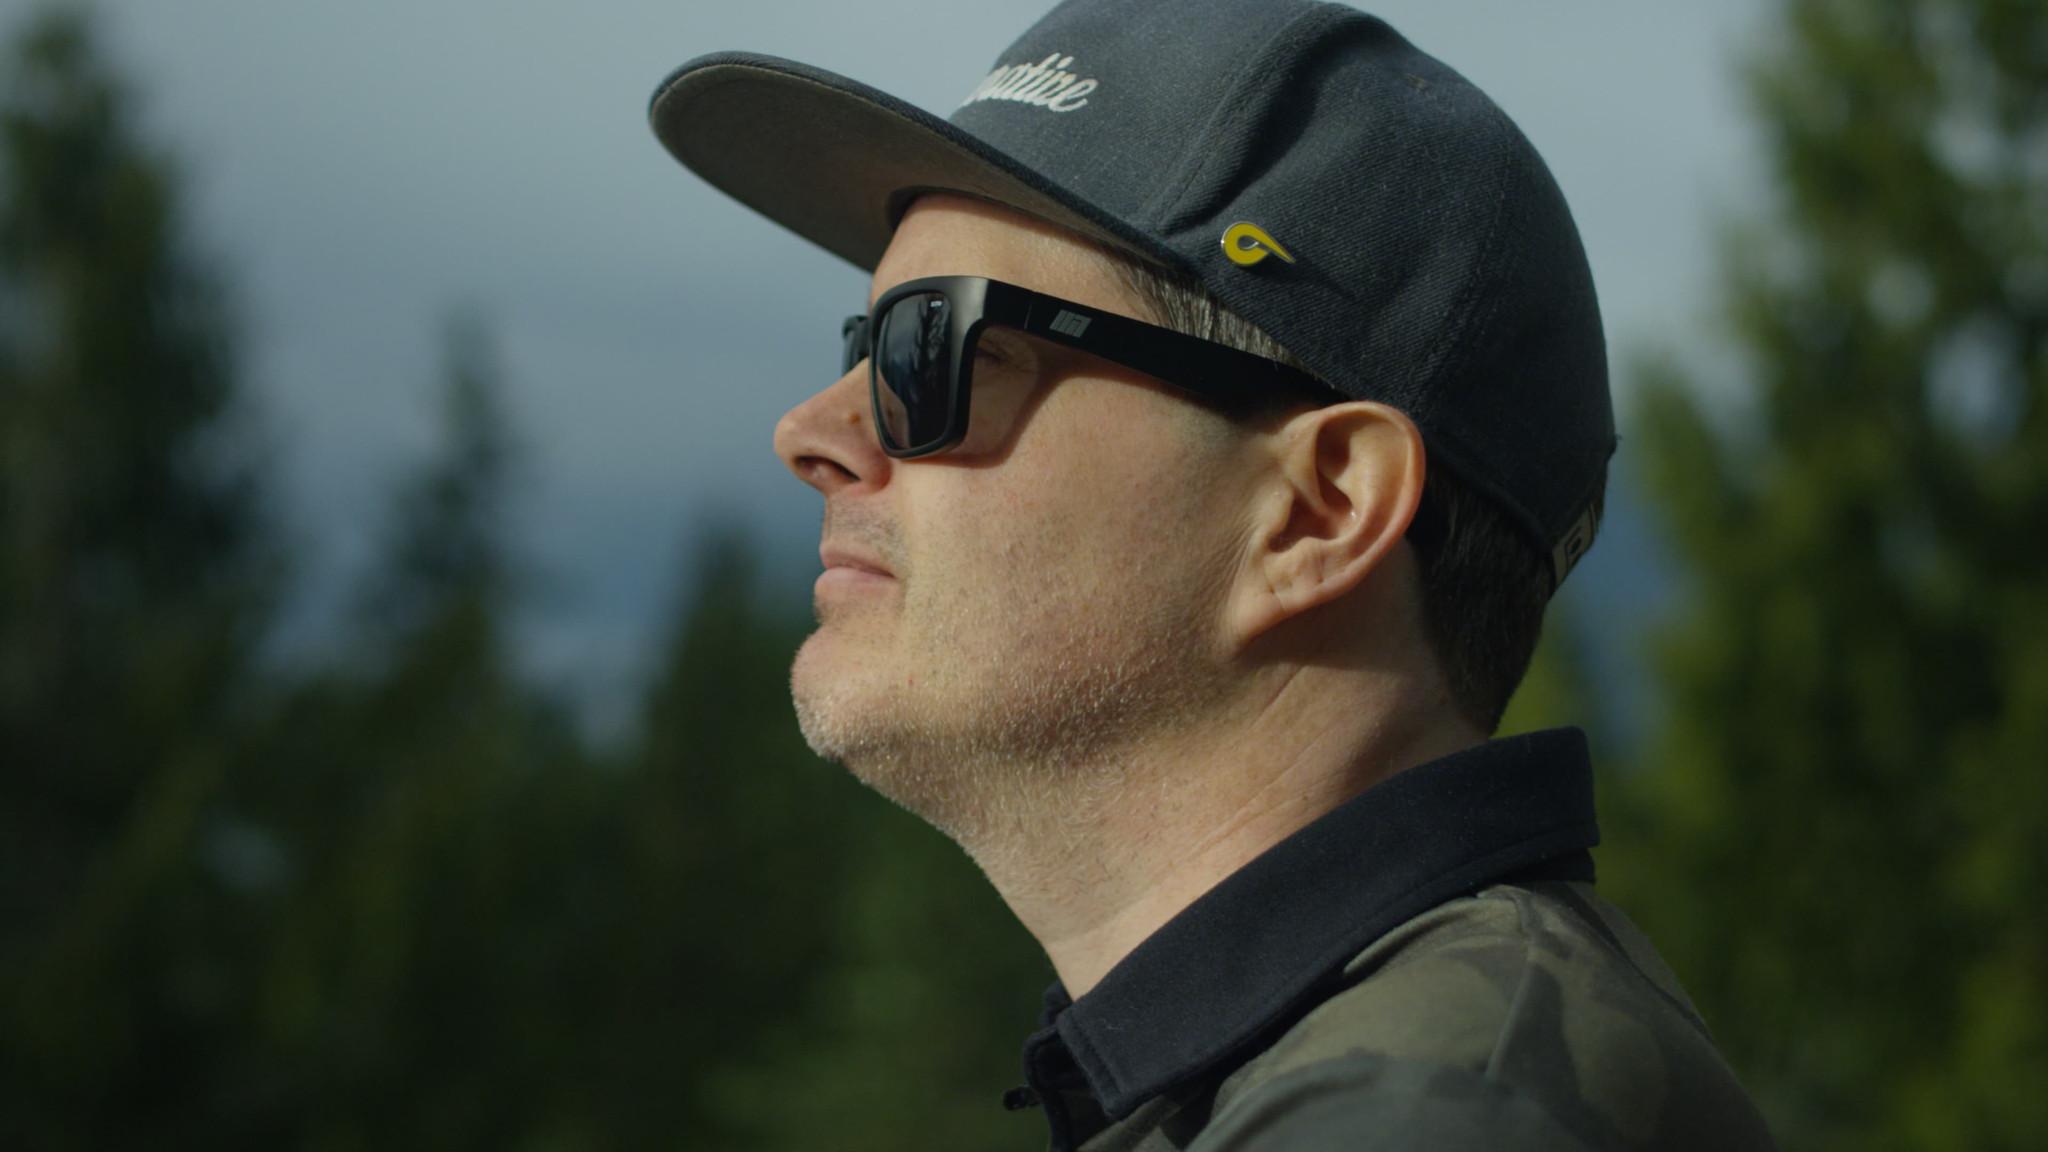 7 Major Benefits of Wearing Polarized Sunglasses